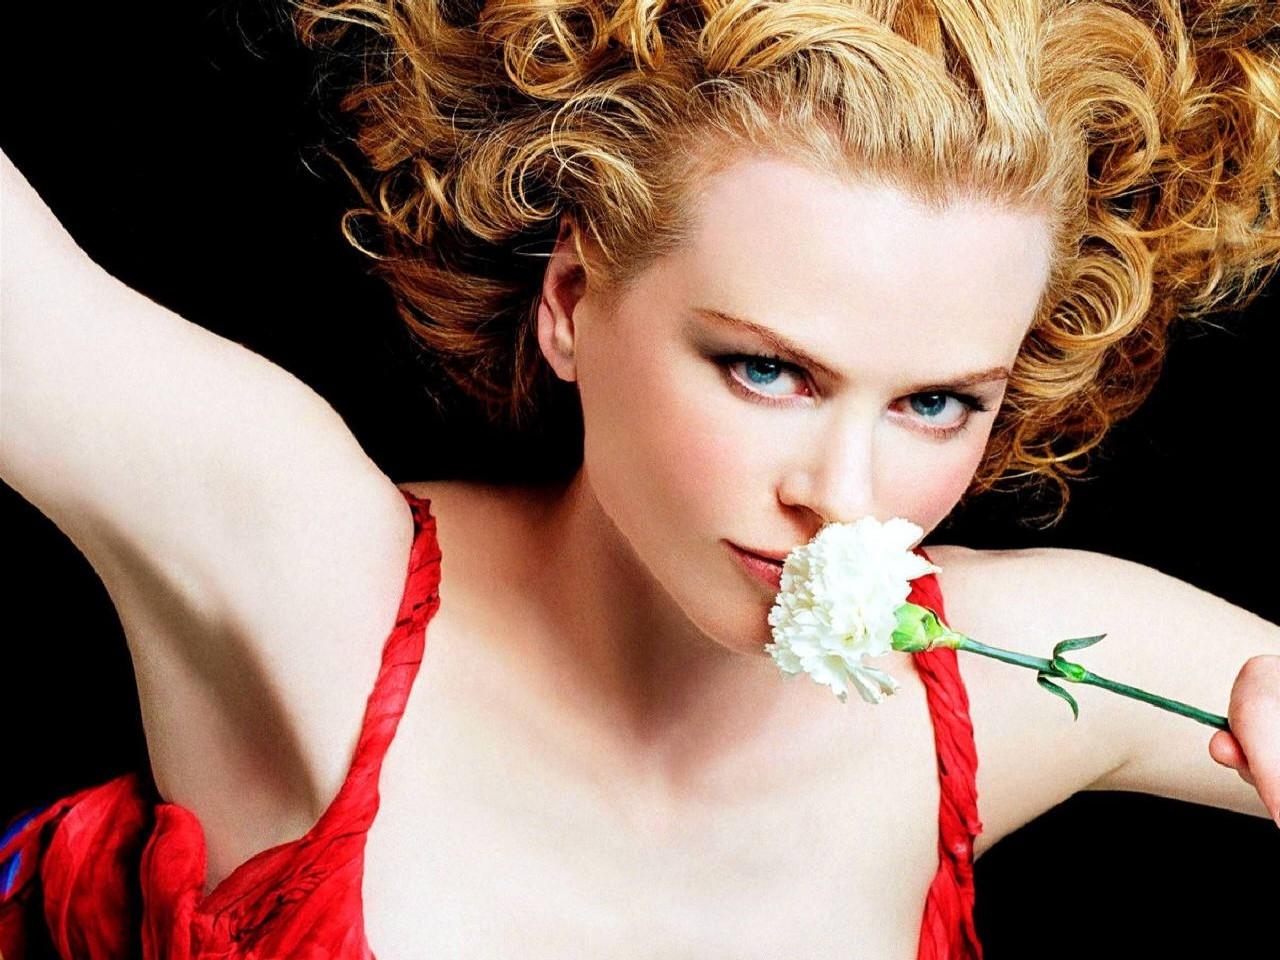 Wallpaper della star australiana Nicole Kidman